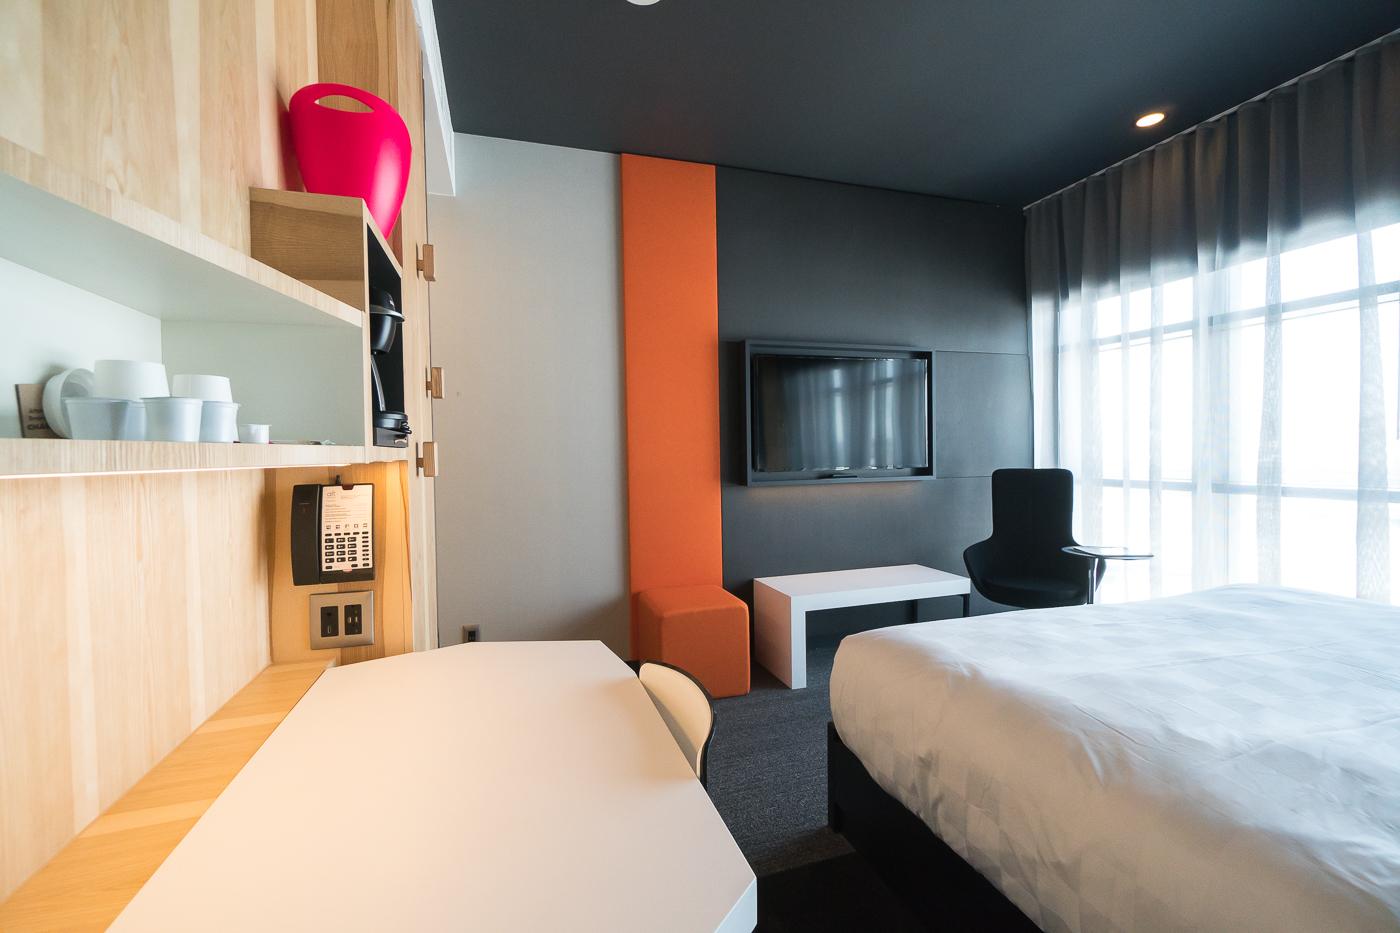 Hôtel moderne où loger à Calgary - Hotel ALT